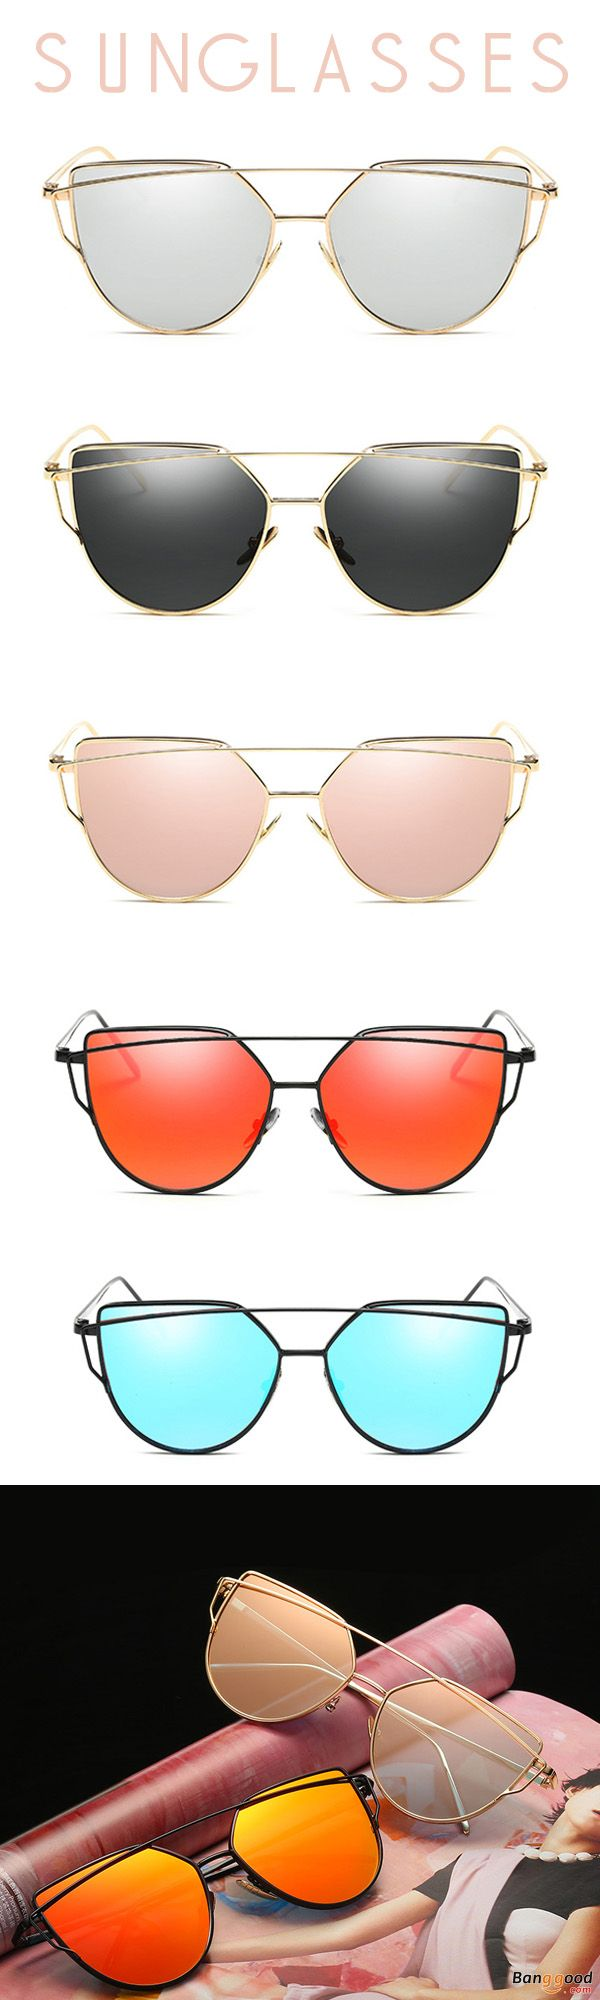 best 25+ summer sunglasses ideas on pinterest | sunnies sunglasses